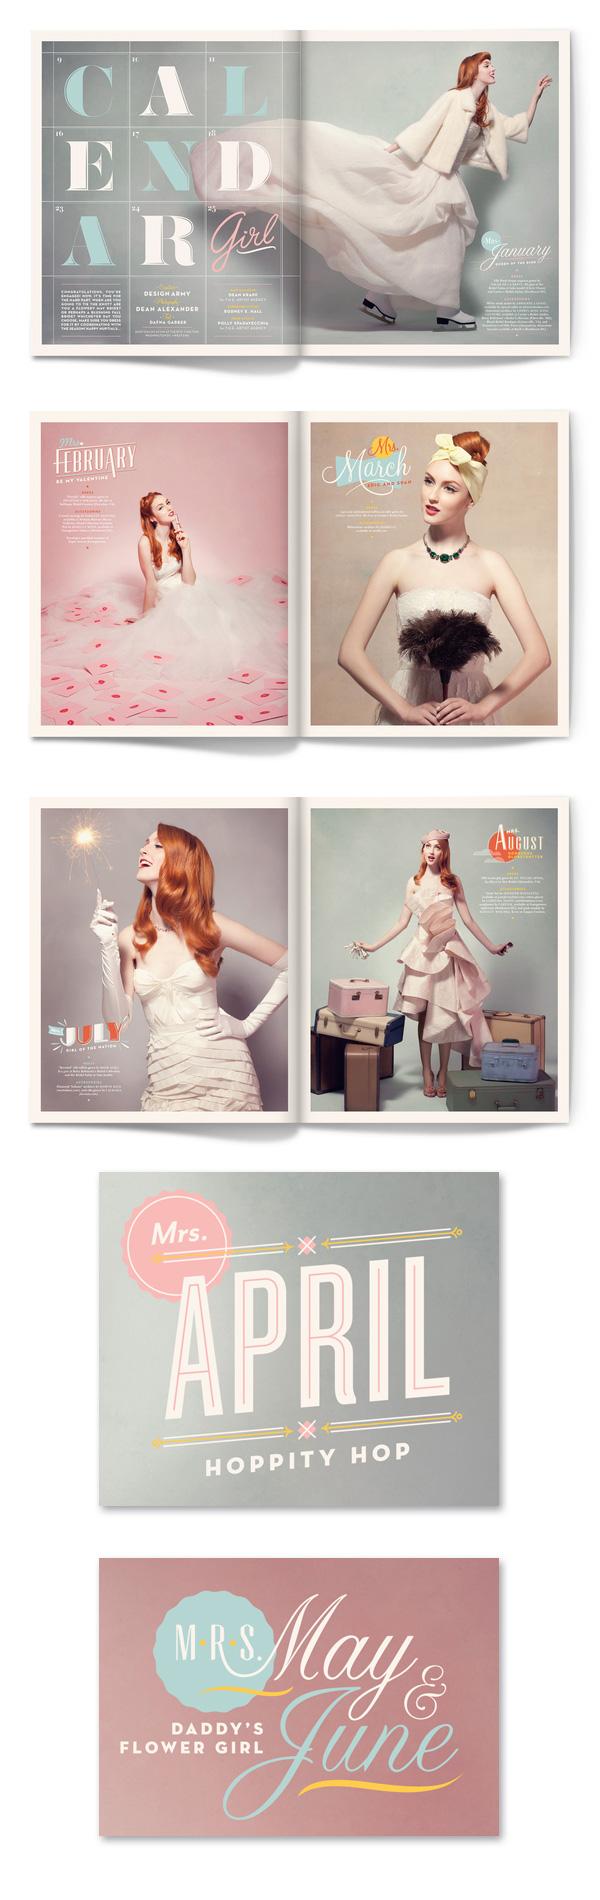 """Calendar Girl"" by Matt Chase at ""Design Army"" - #design #layout #calendar #girl"